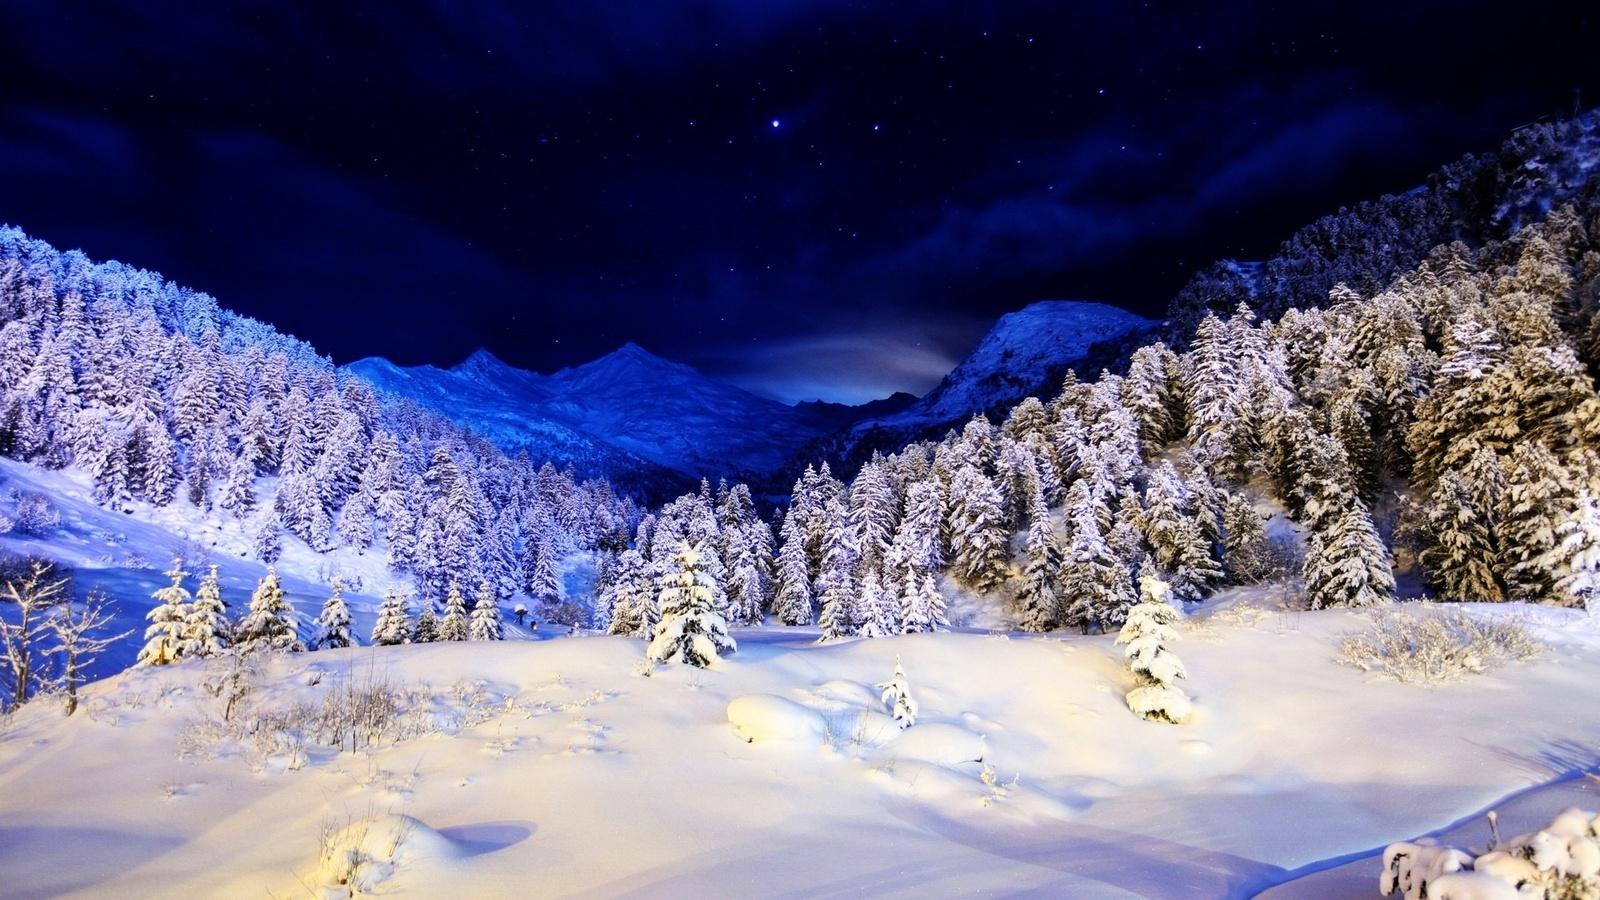 Картинки на телефон природа зима, открытка мужа день